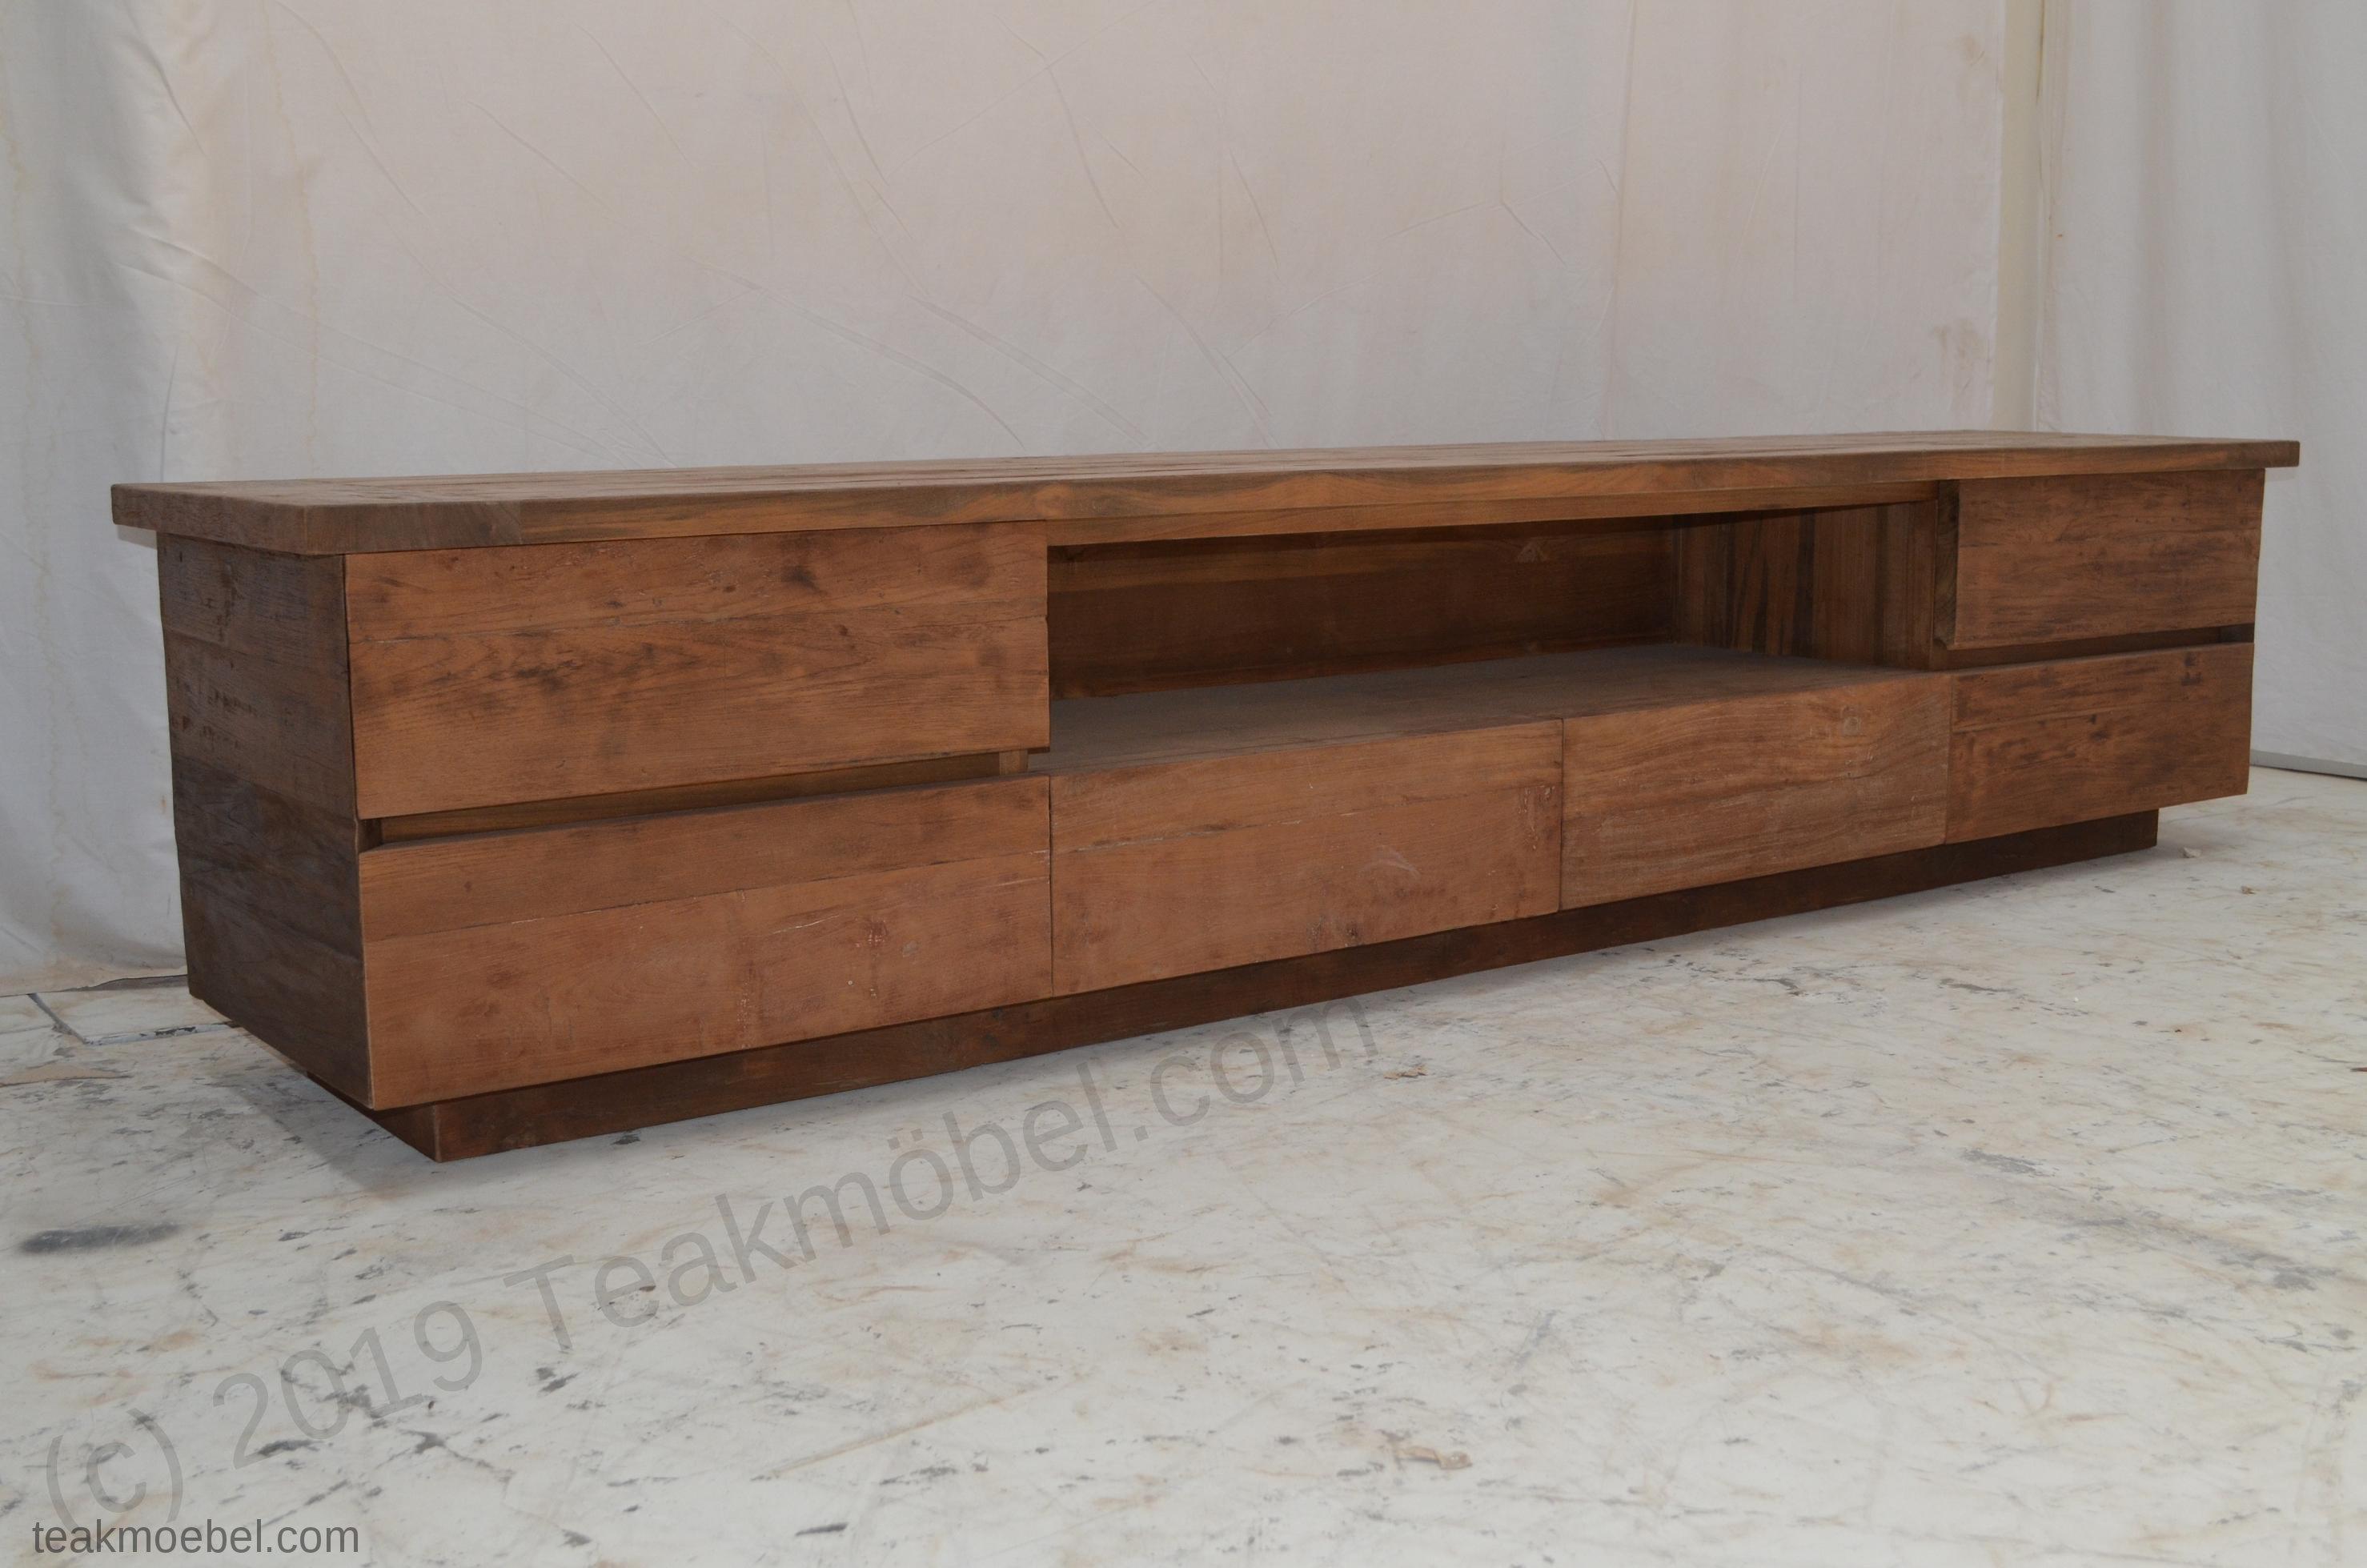 Sideboard Fernsehmöbel teak fernsehmoebel dingklik 240cm teakmöbel com